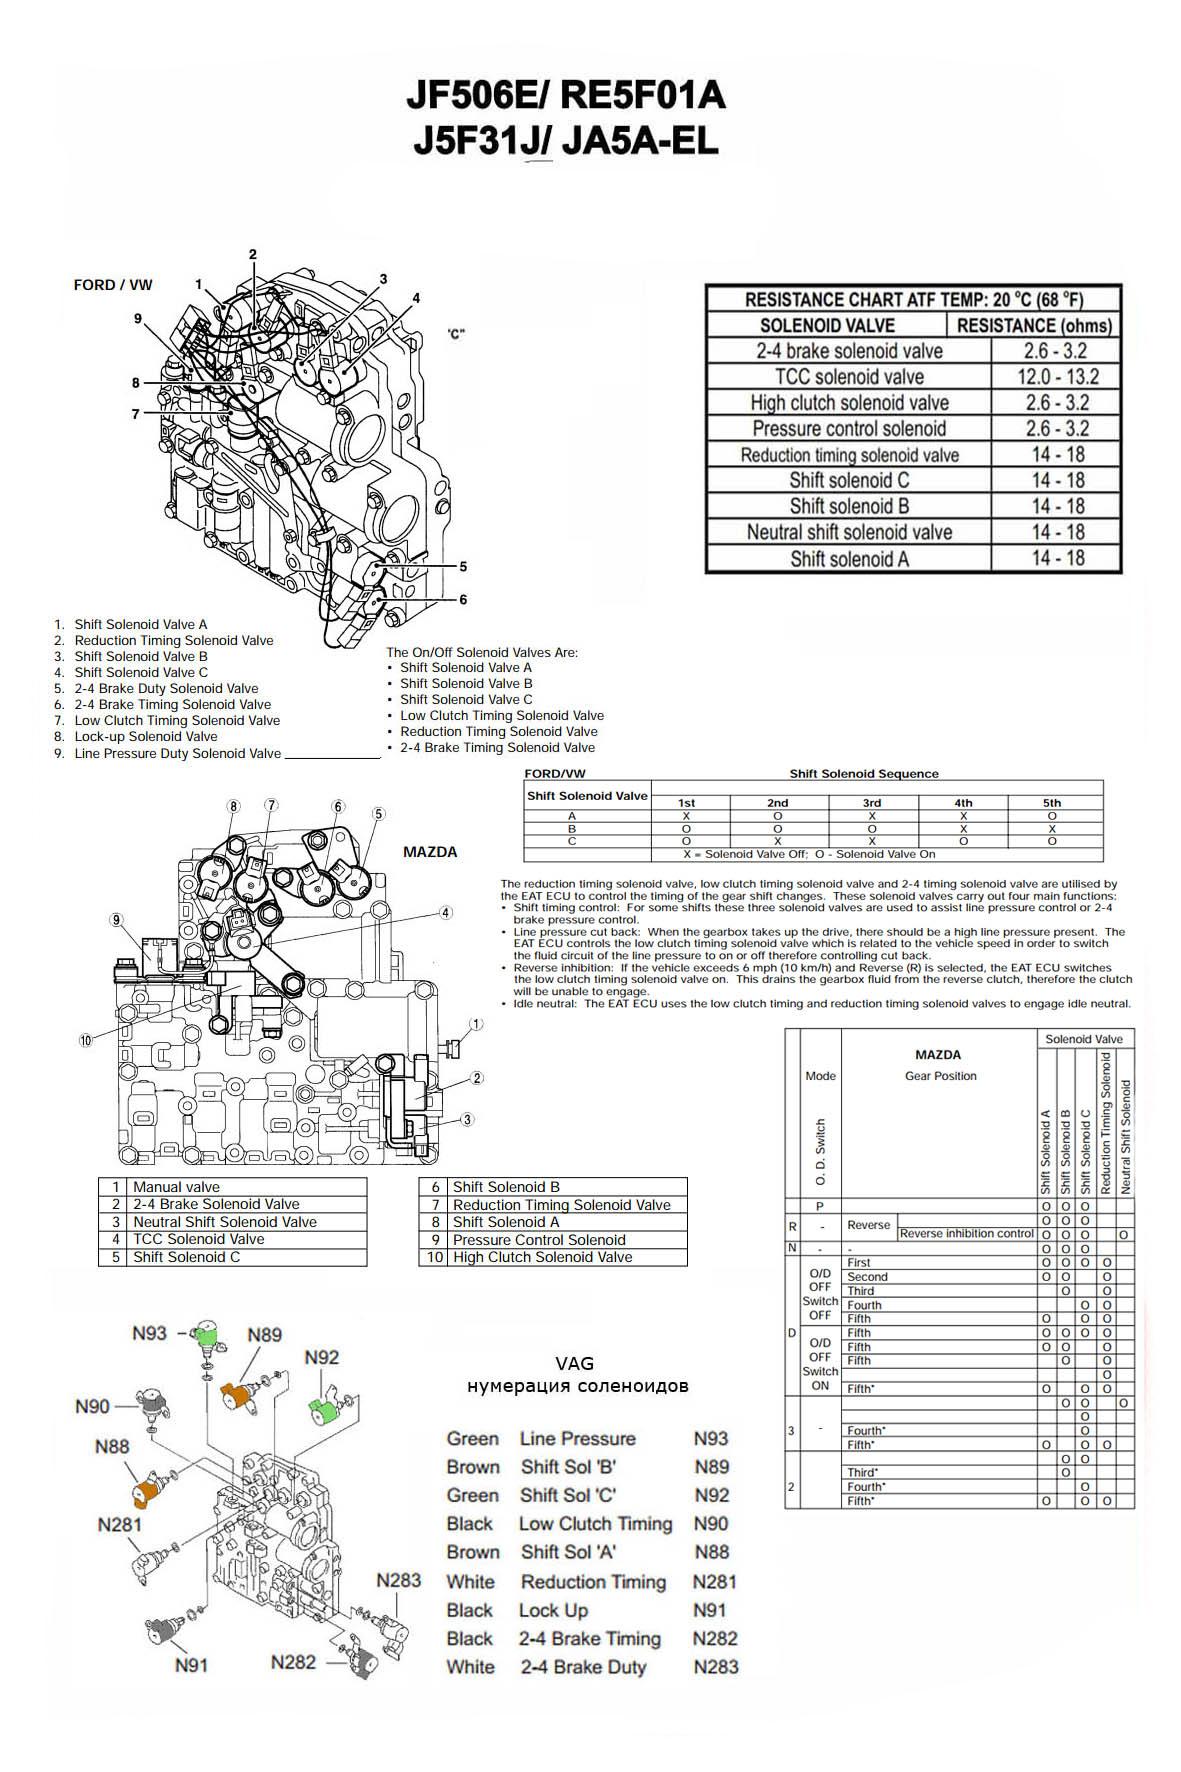 Solenoid application chart JF506E